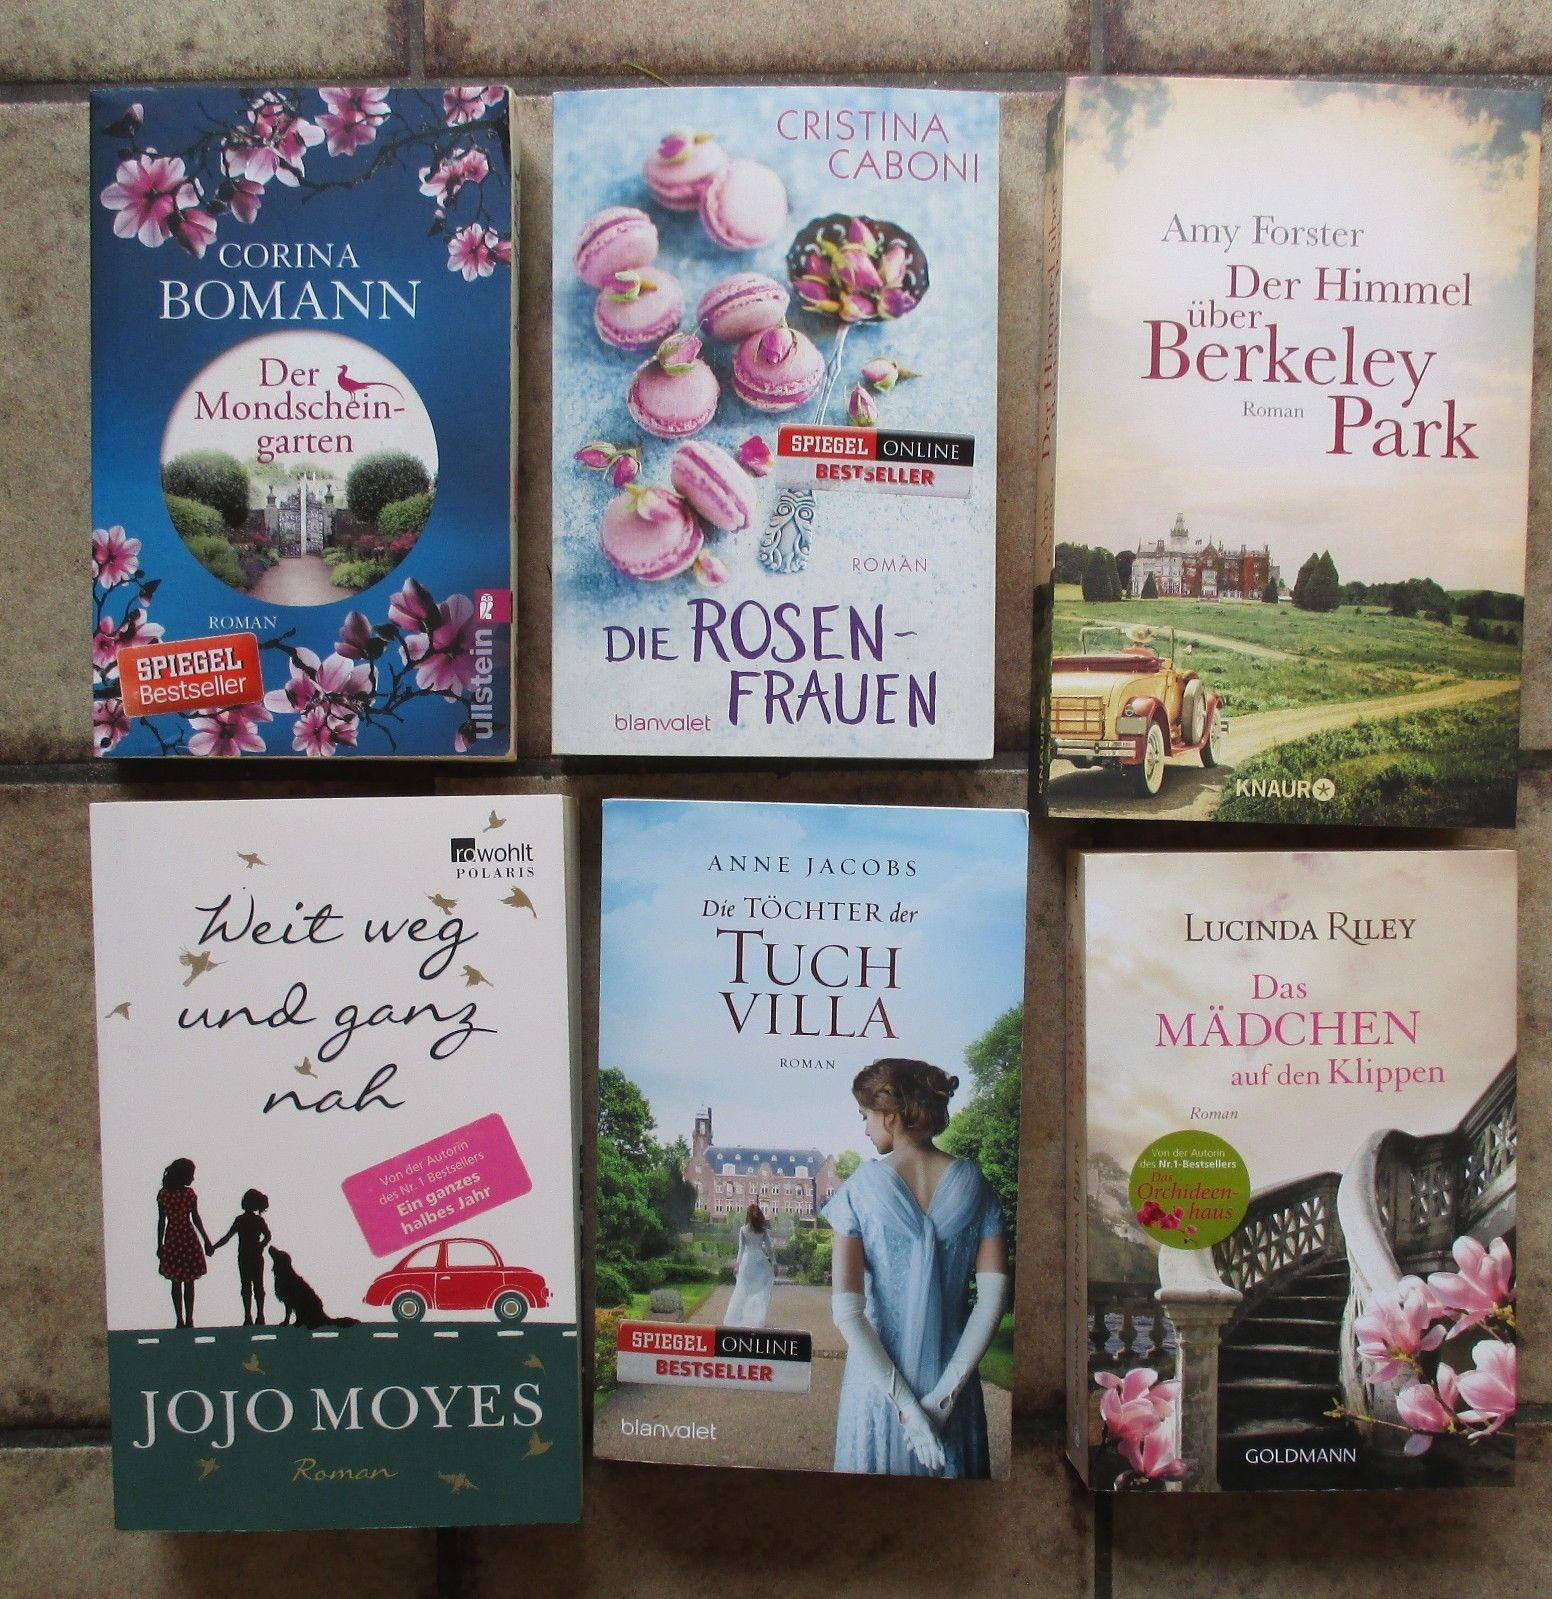 Bücherpaket Frauenromane Anne Jacobs, Lucinda Riley, Corina Bomann, Caboni u.a.